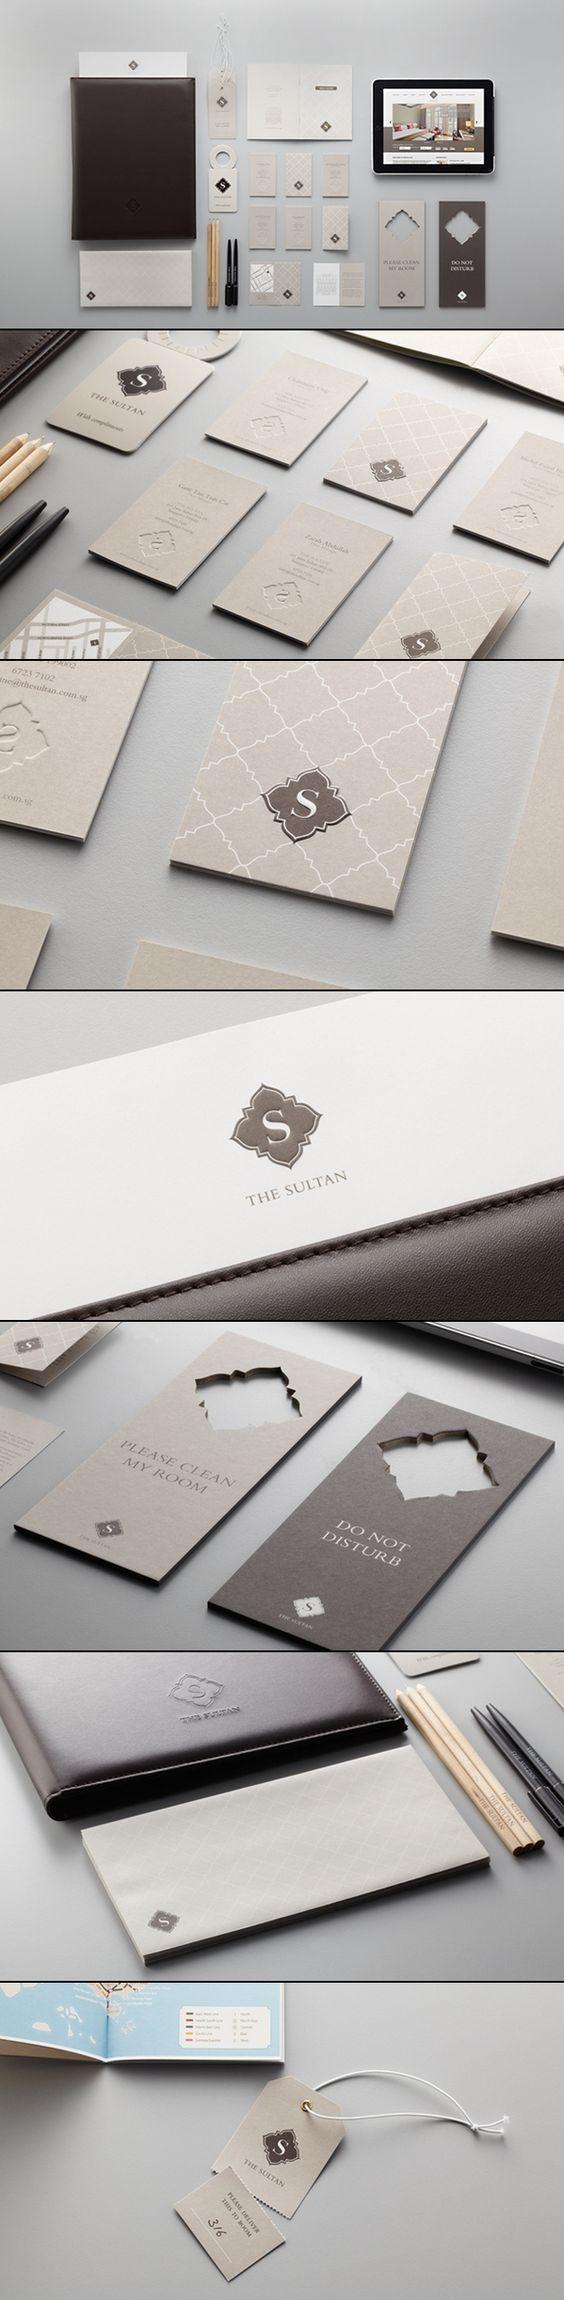 Identidade visual do hotel boutique The Sultan